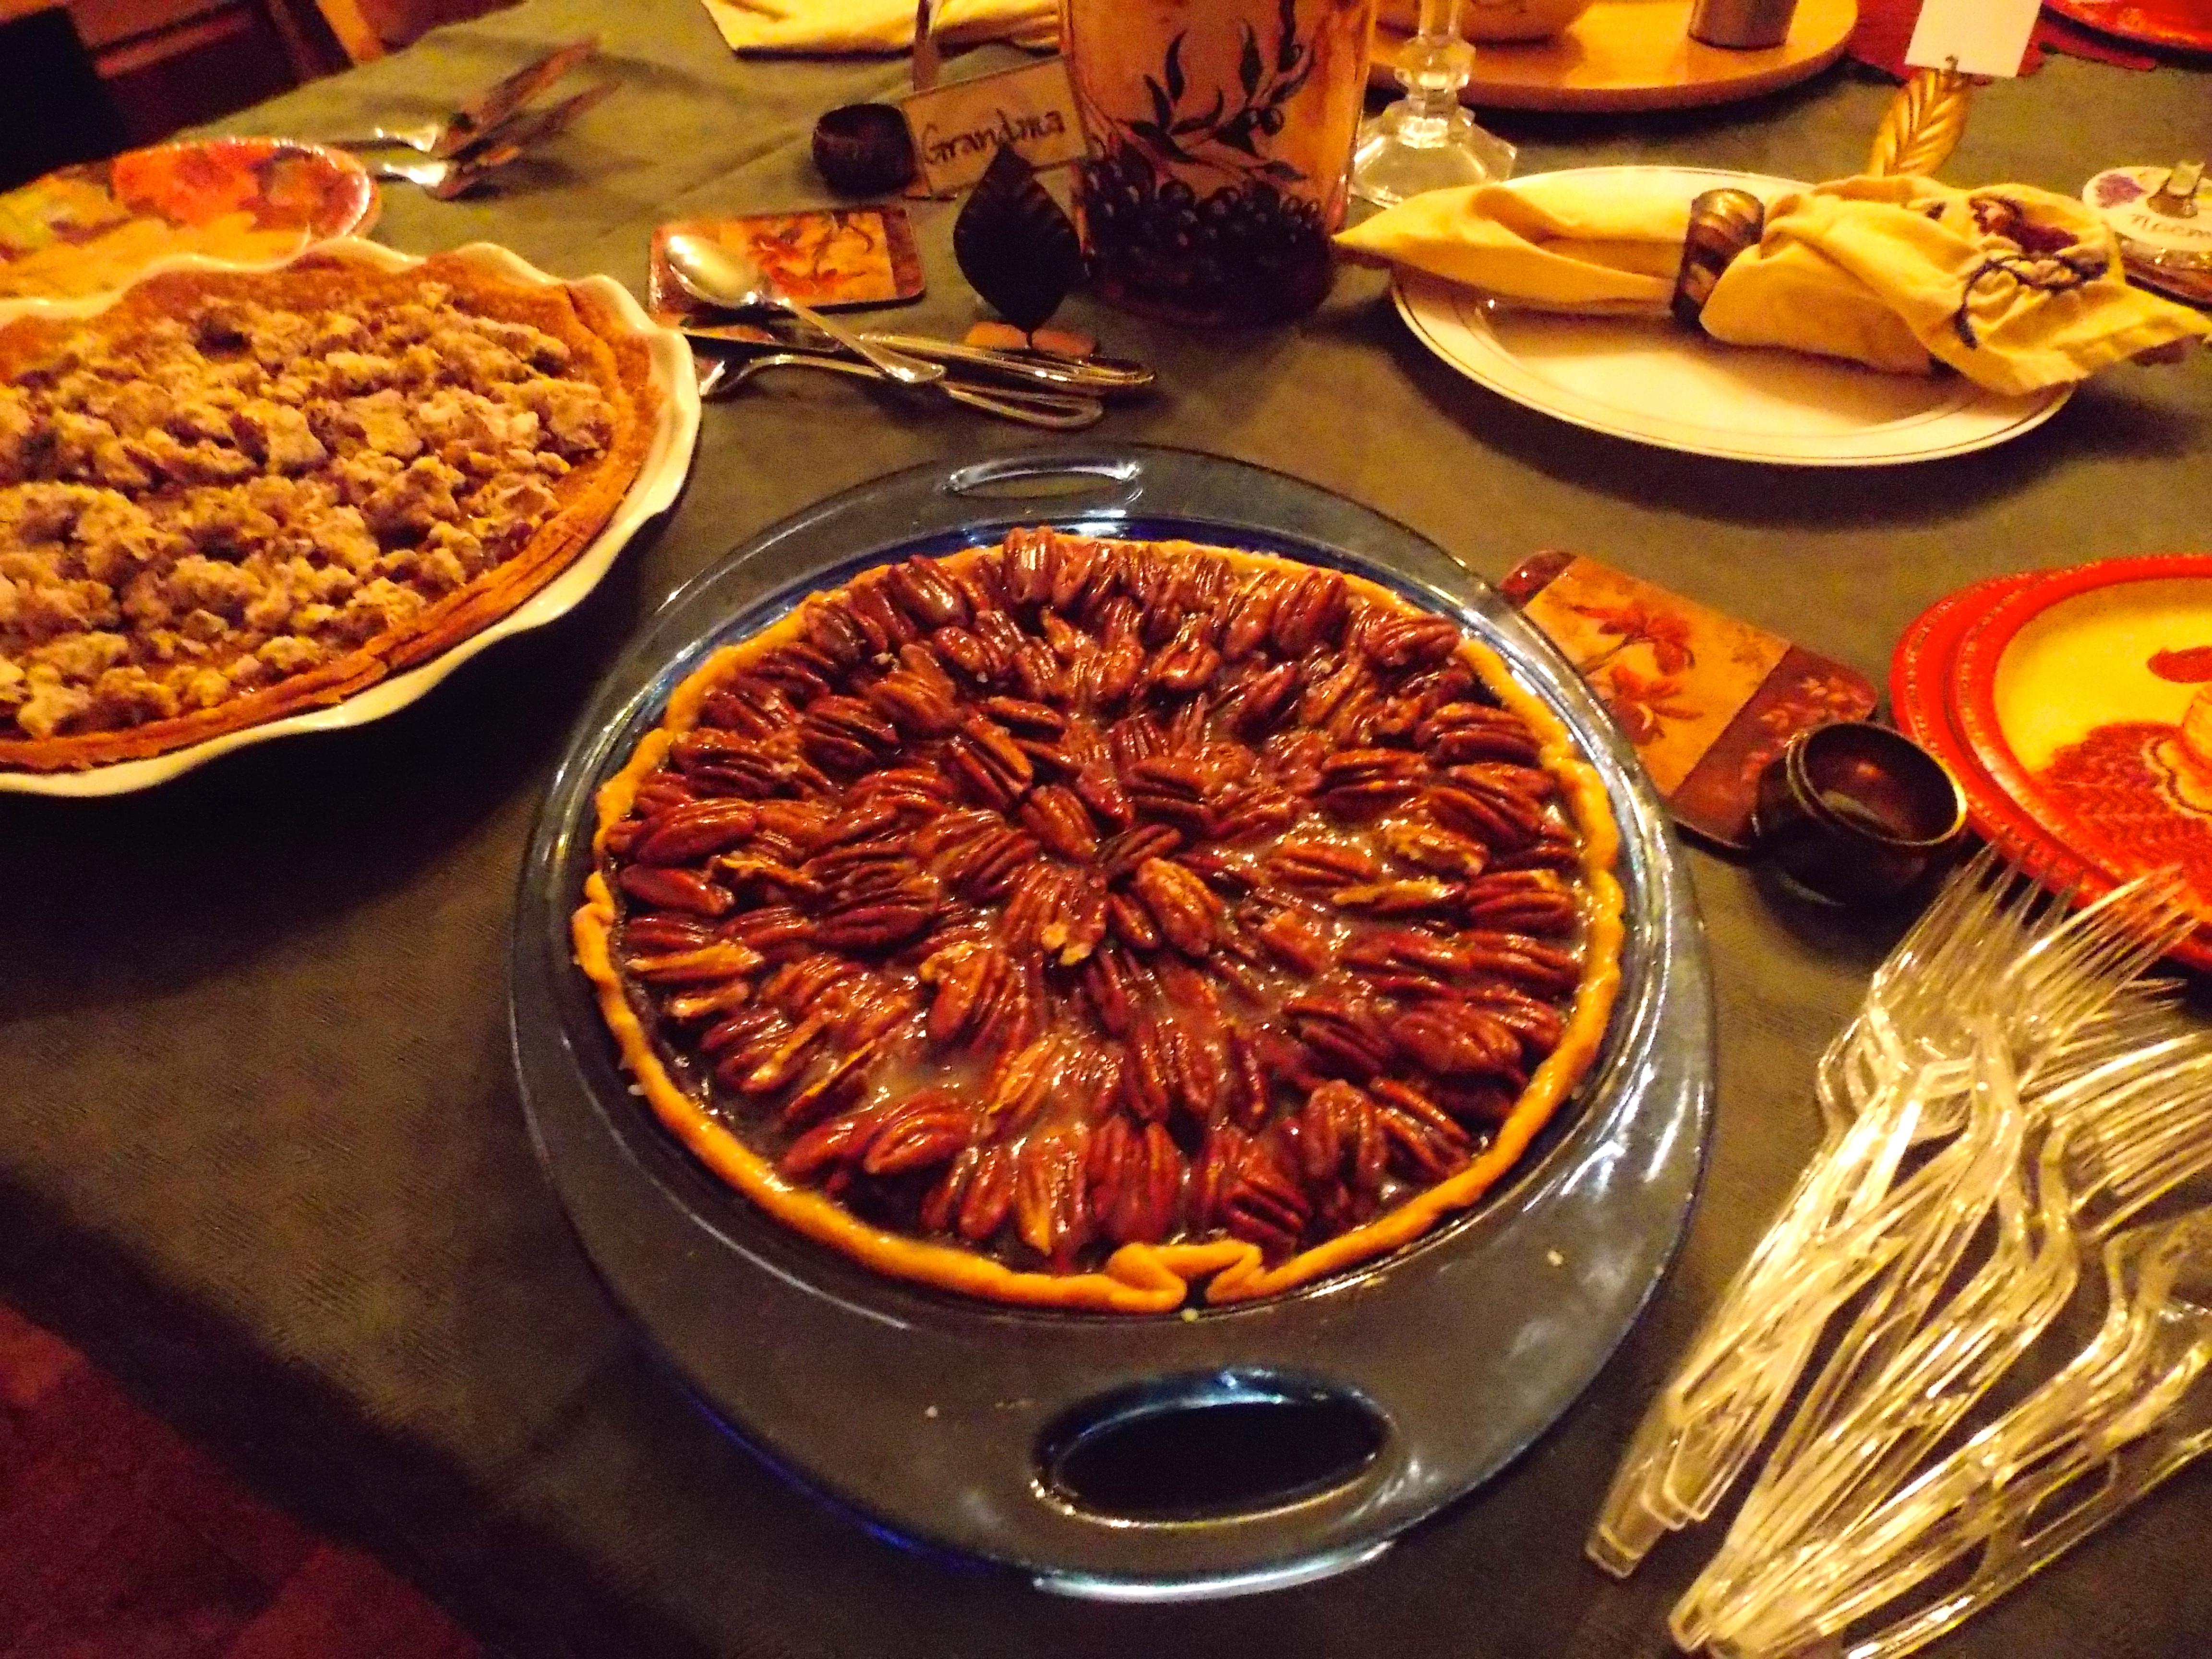 Food Magazine Treasures:  Salted-Caramel Chocolate Pecan Pie